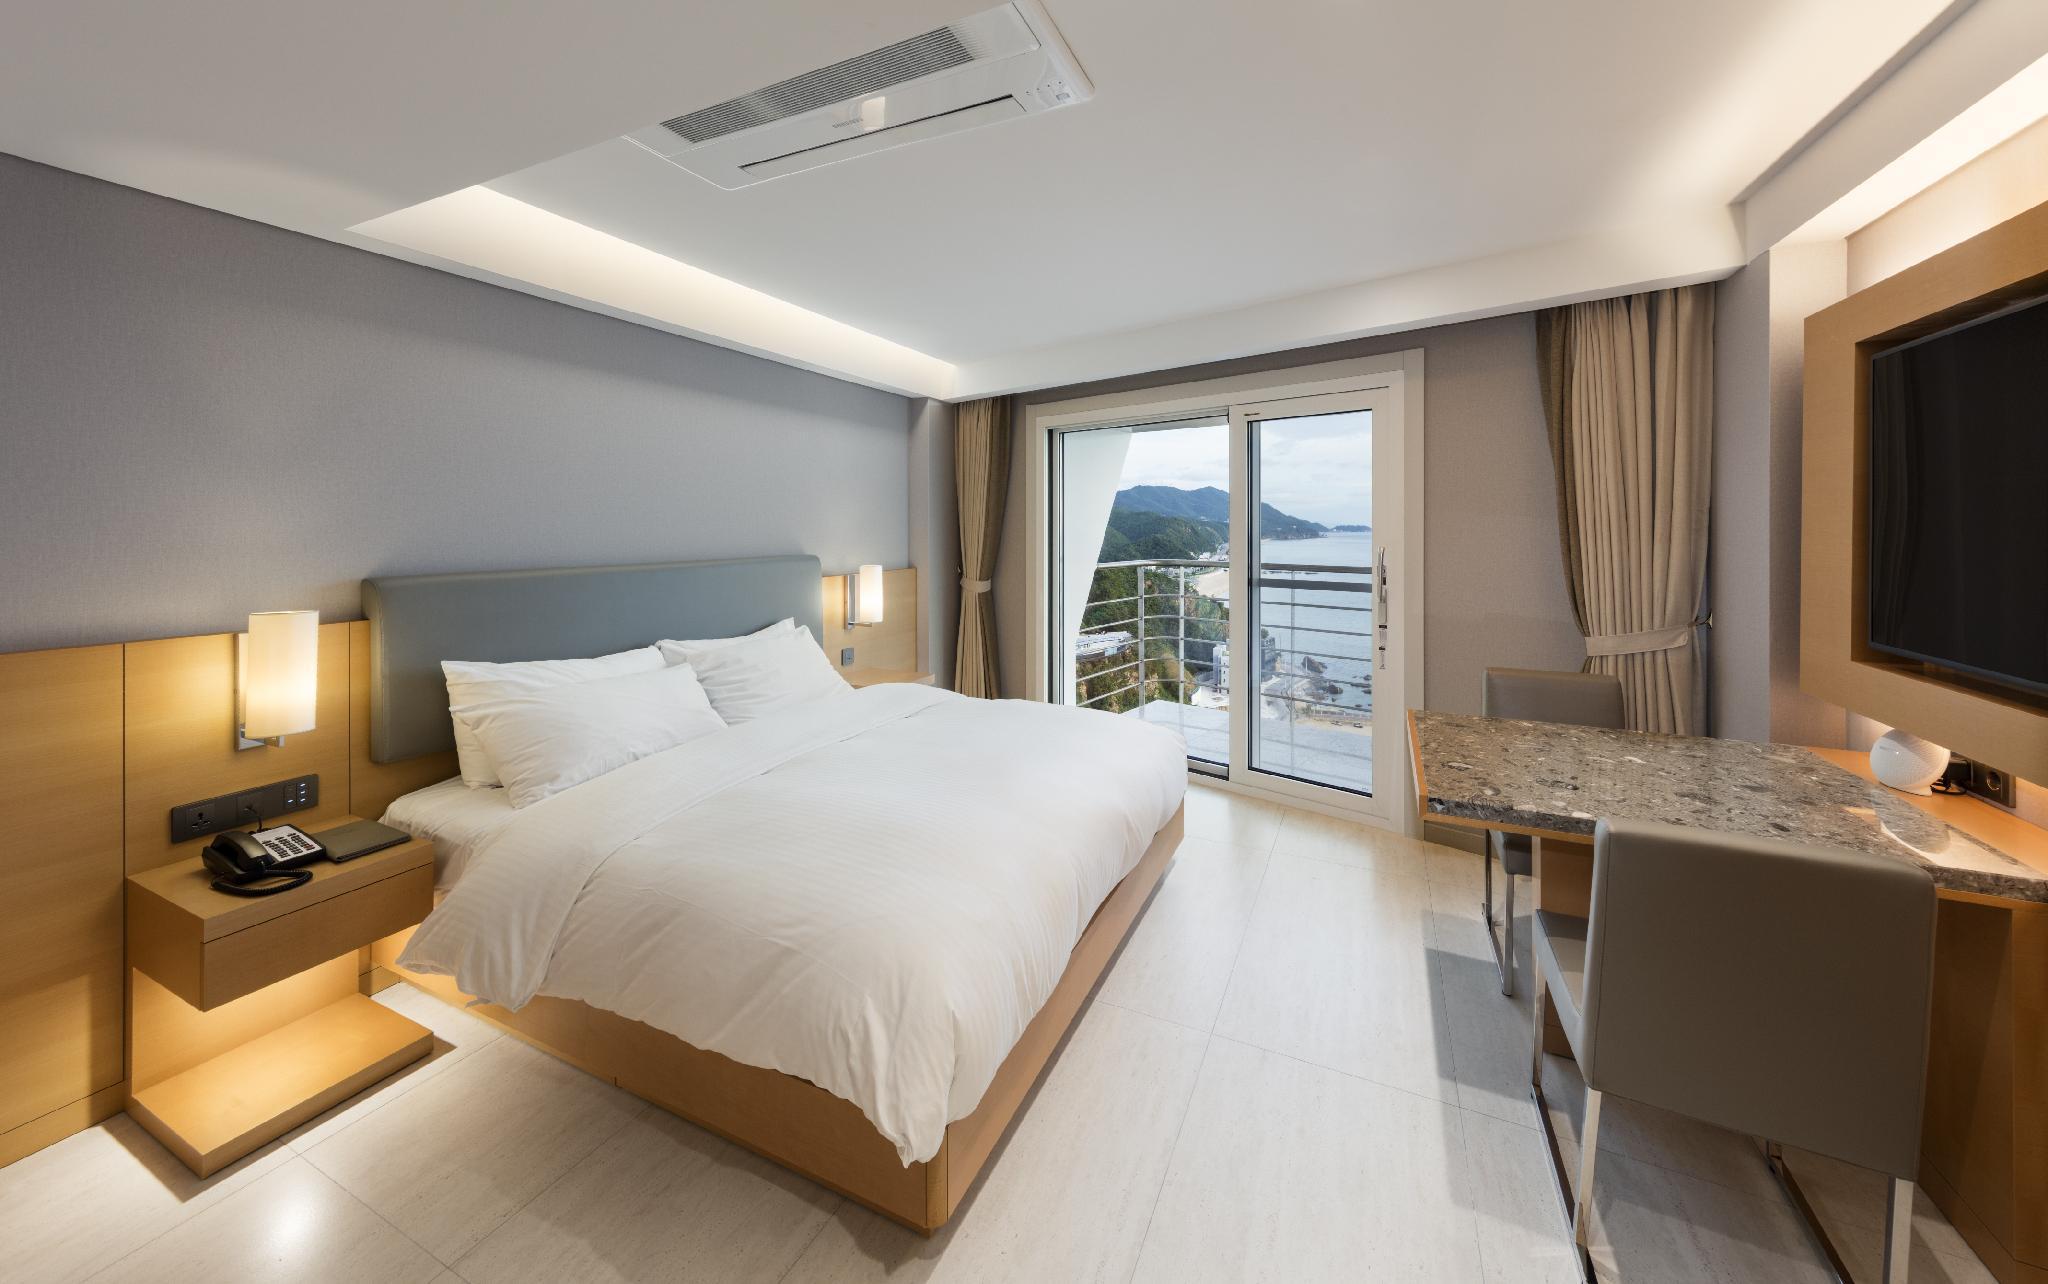 m 景观: 海景(ocean) 1张双人床 输入日期查看房价 suncruise海景酒店